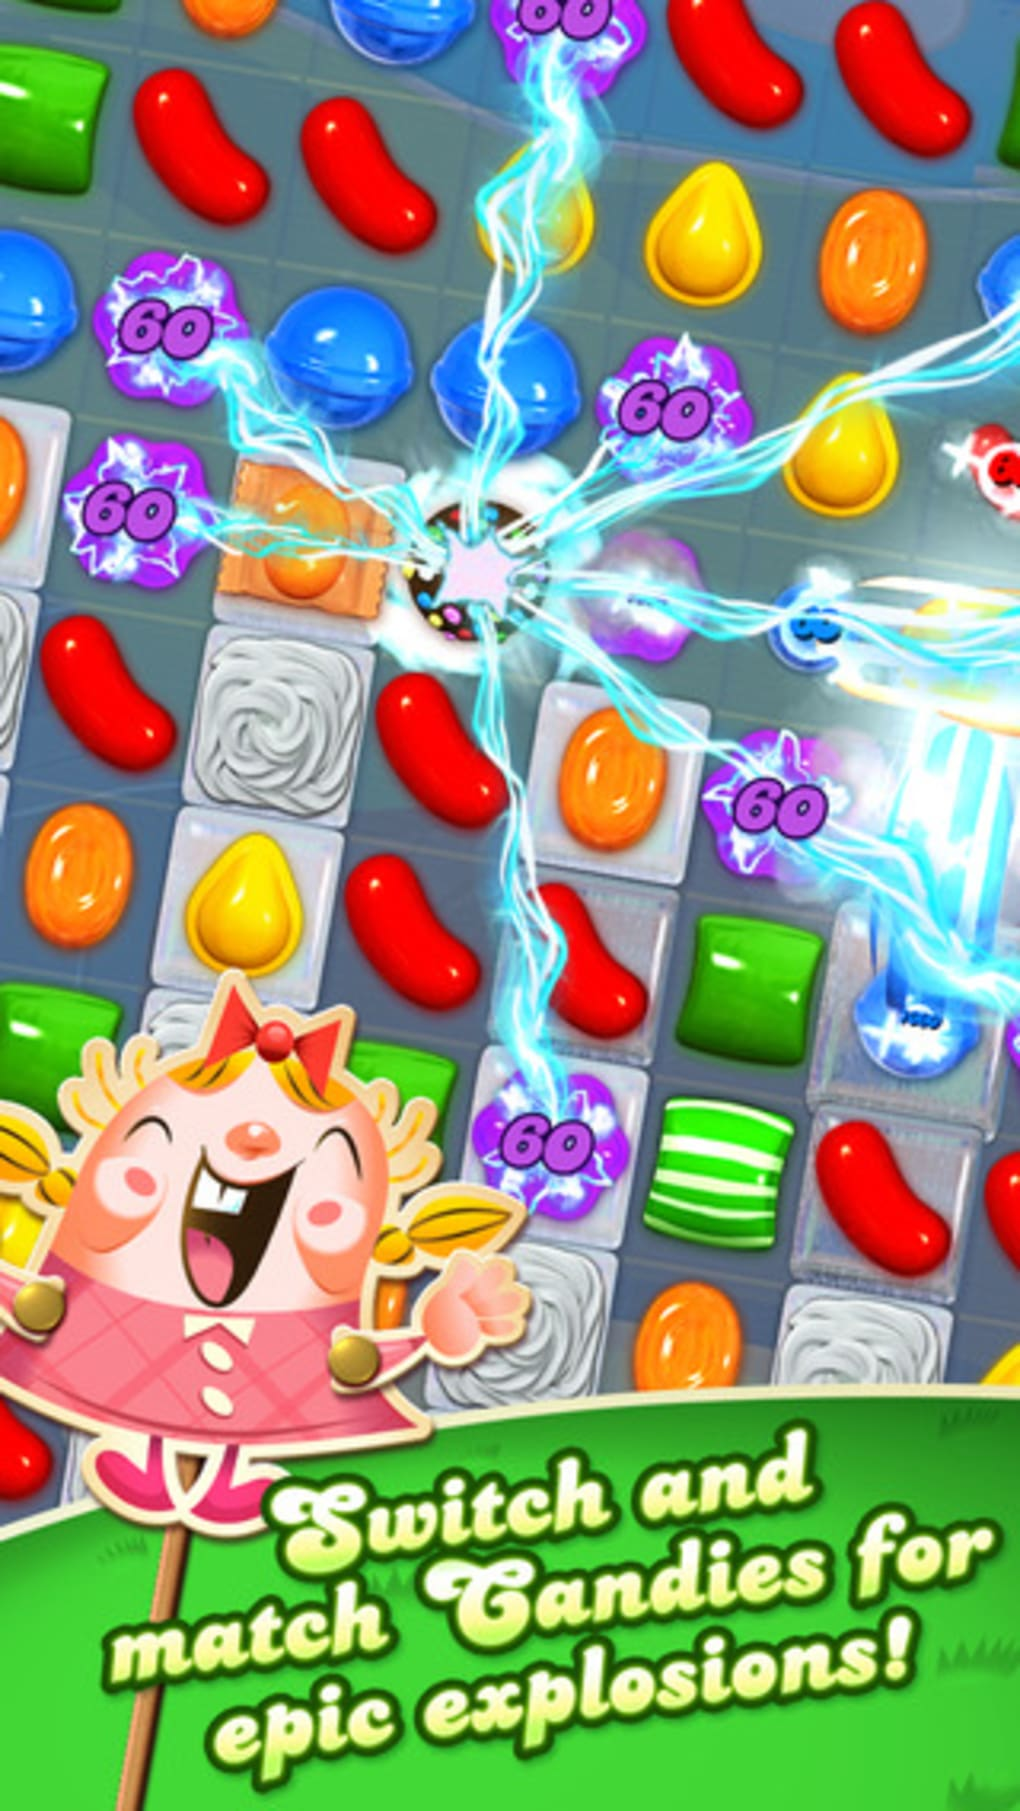 Las vegas online slot machines free